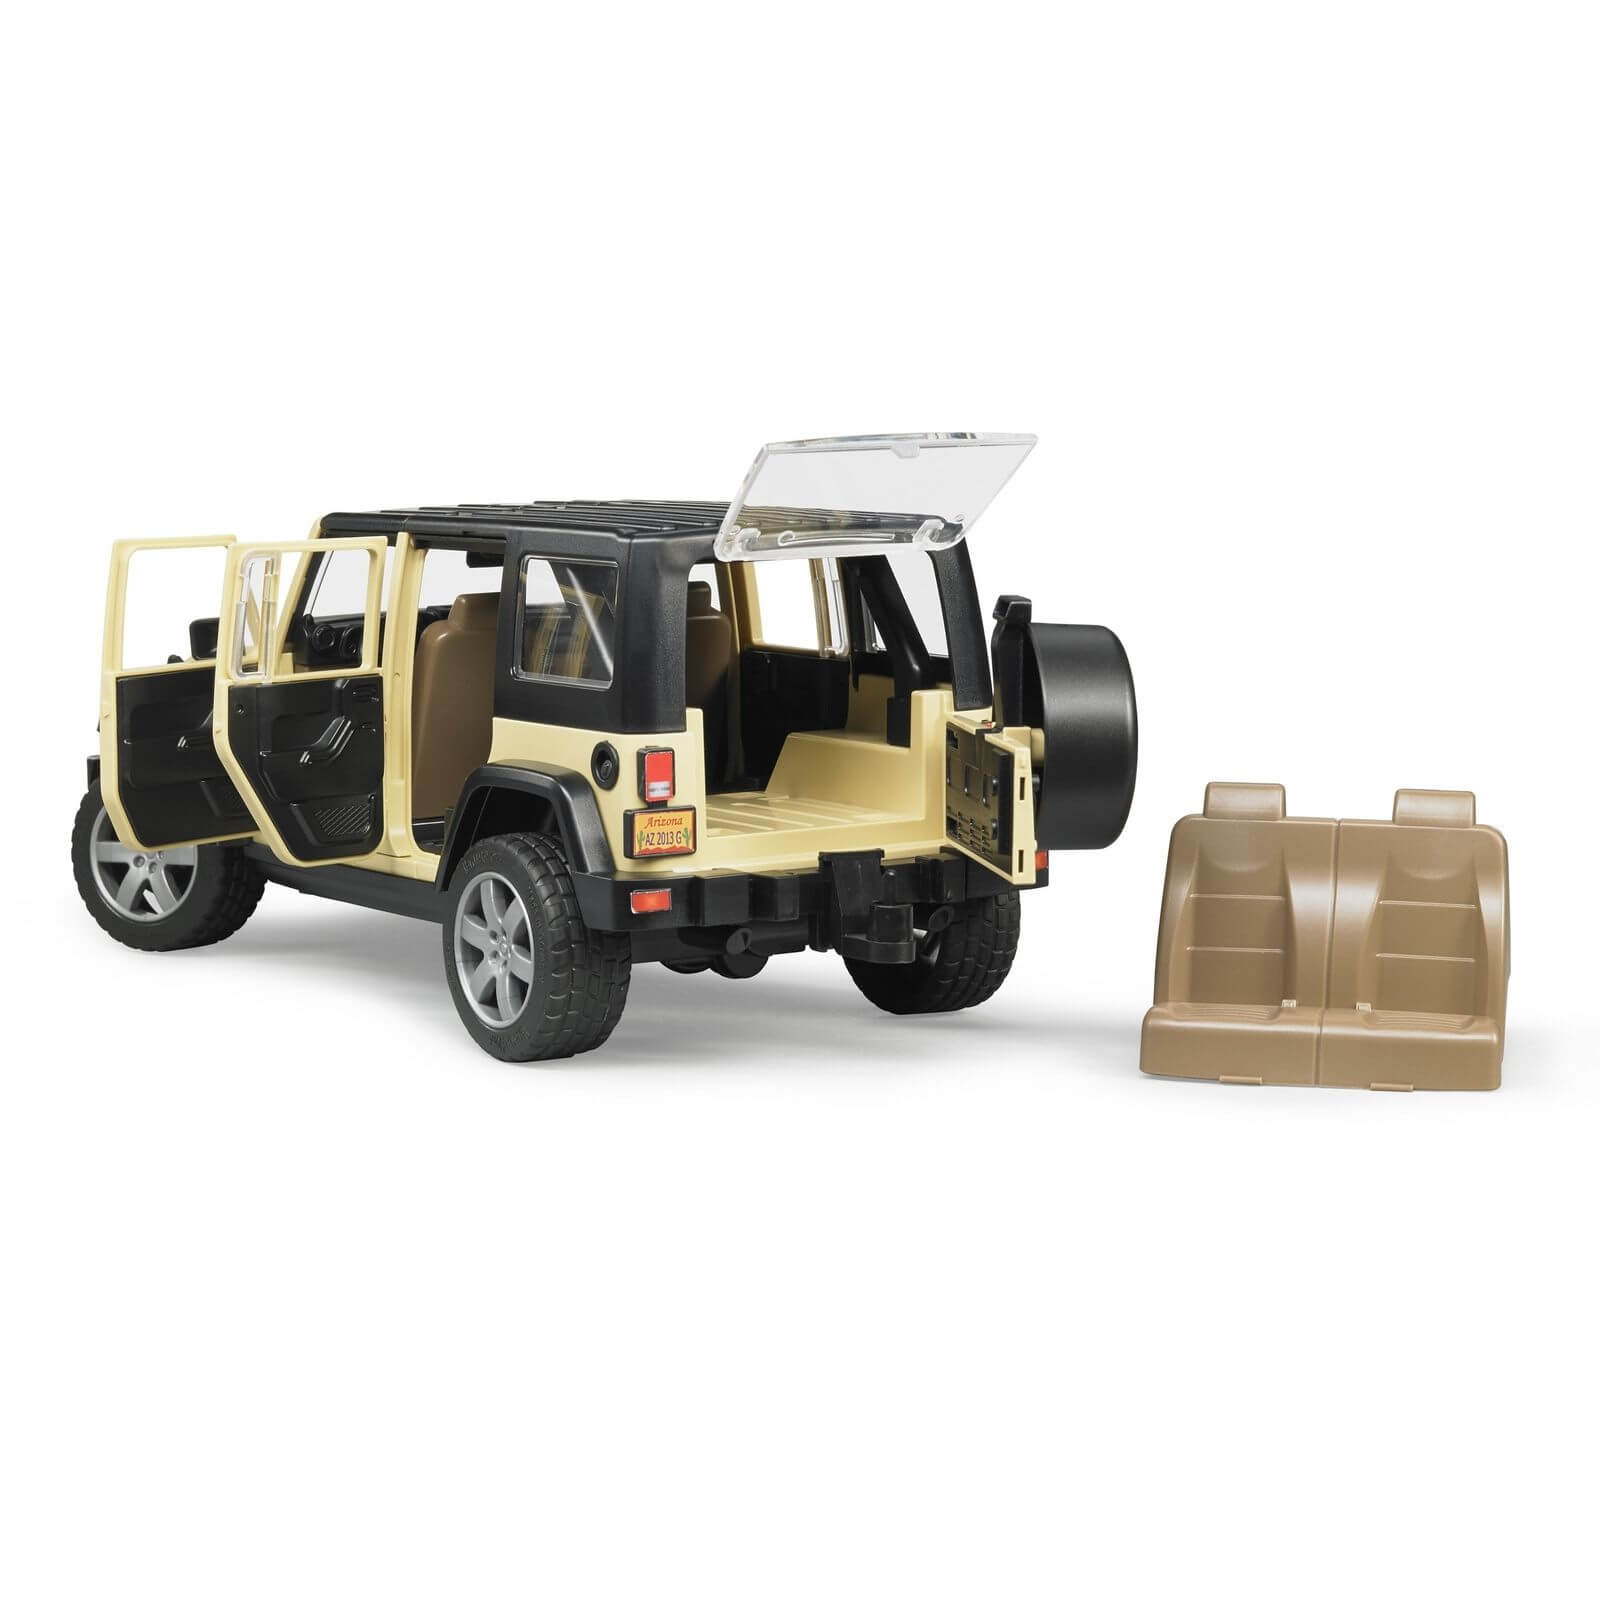 Wrangler Rubicon 4 Door >> Bruder Jeep Wrangler Unlimited Rubicon - Jadrem Toys